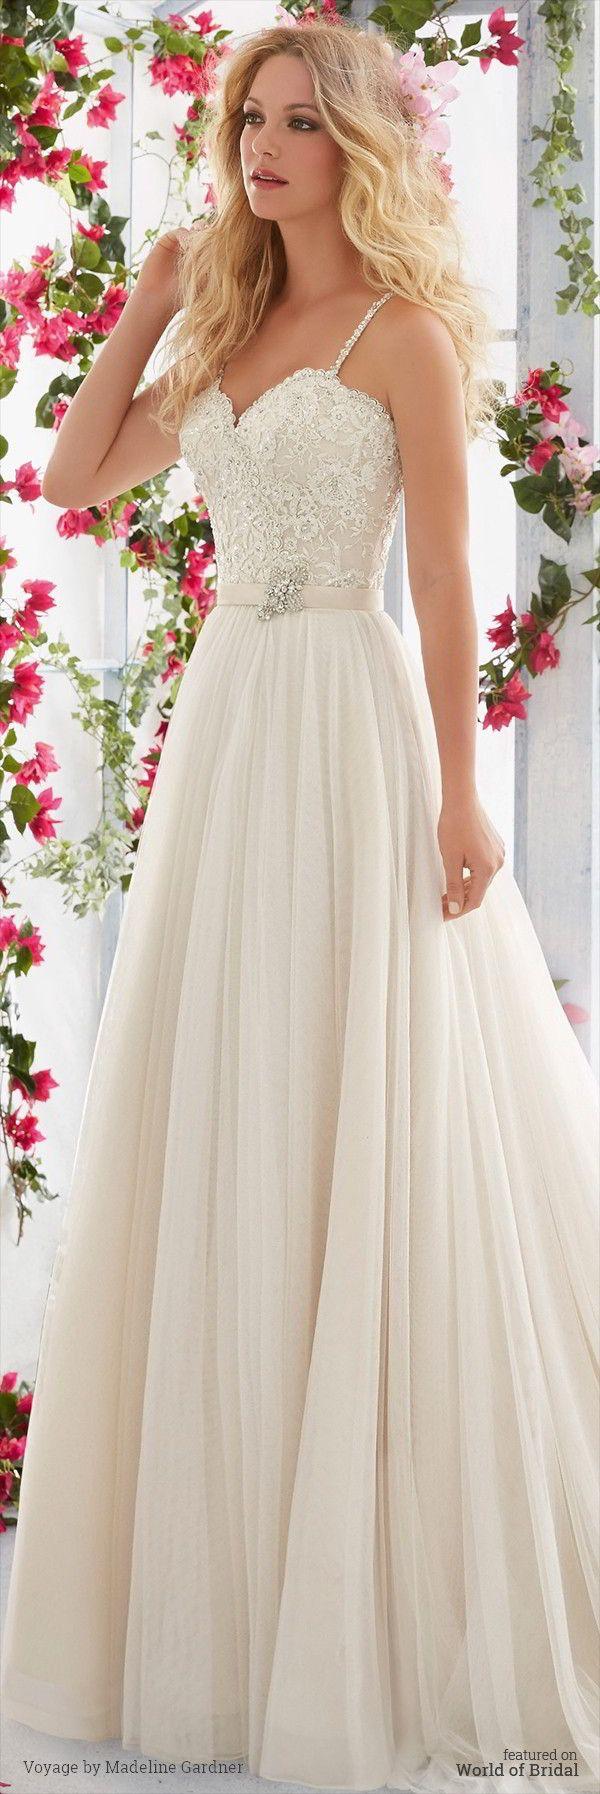 mori lee bridal wedding dress styles Voyage by Madeline Gardner Spring Wedding Dresses Mori Lee